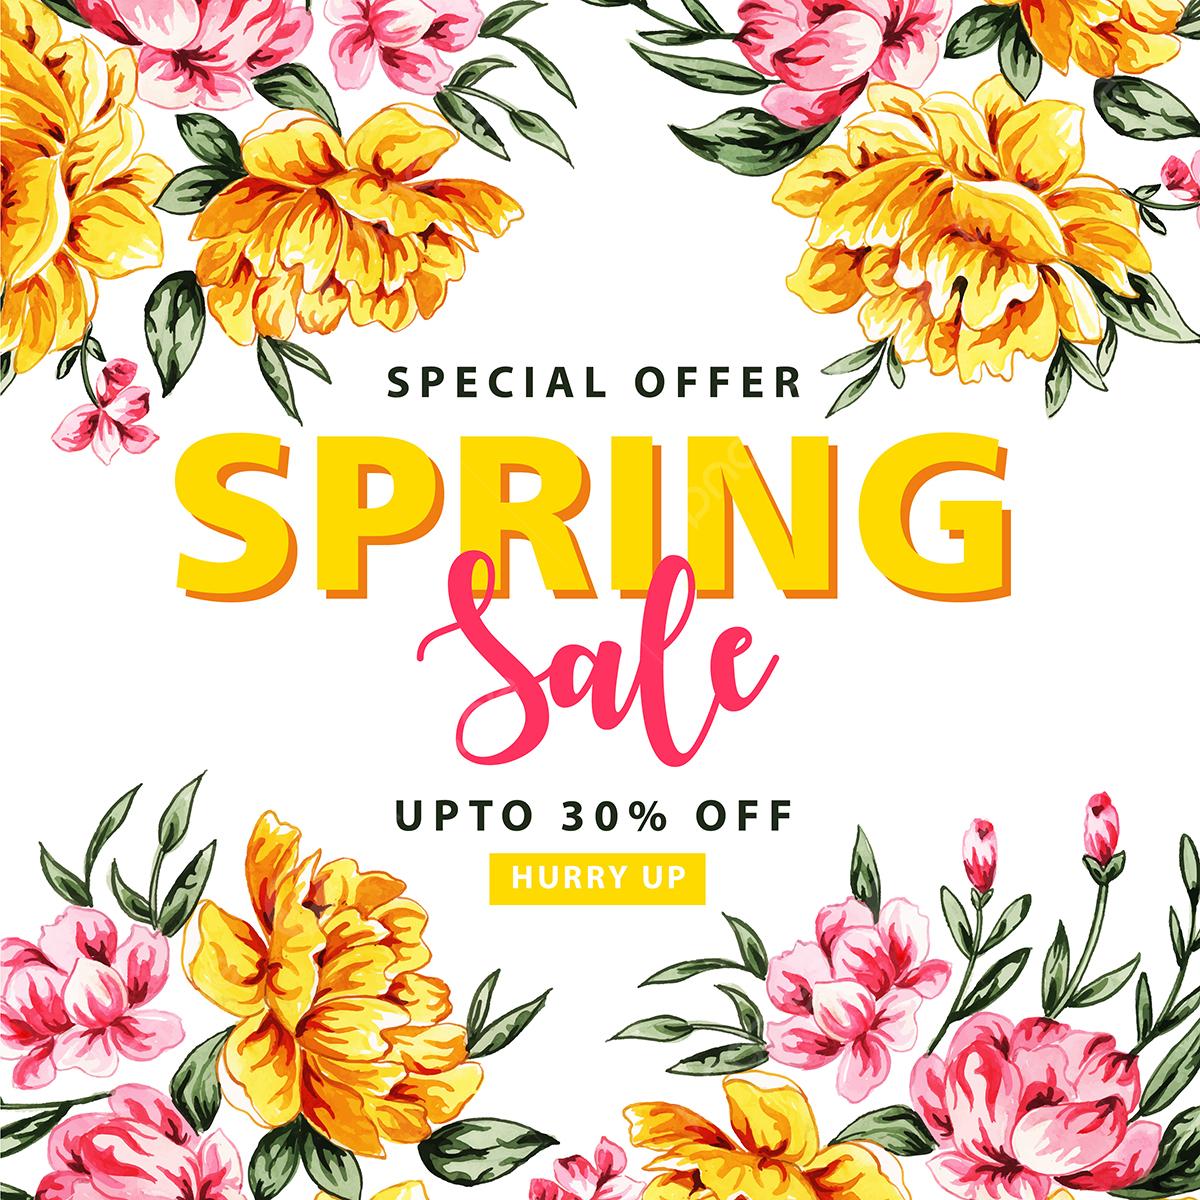 Flower Plant png download - 500*500 - Free Transparent Cordyline png  Download. - CleanPNG / KissPNG